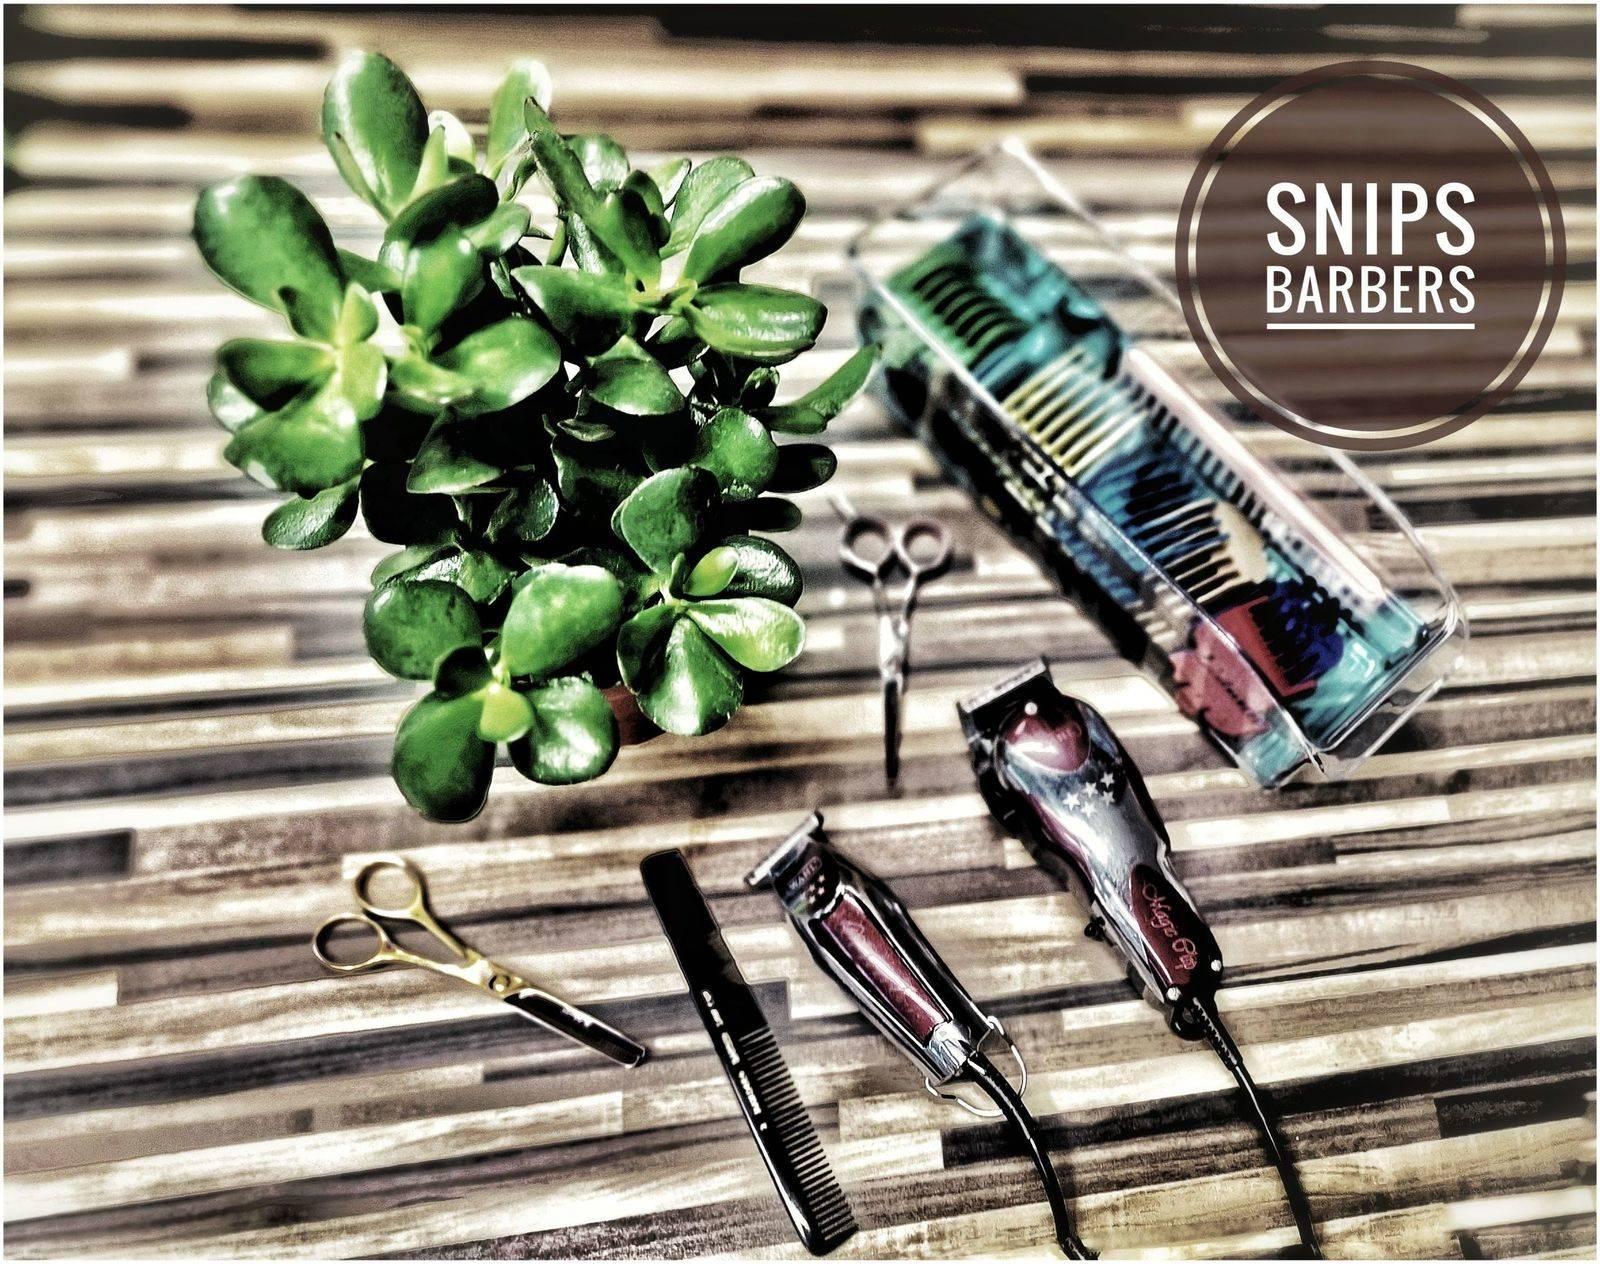 Snips Barbers